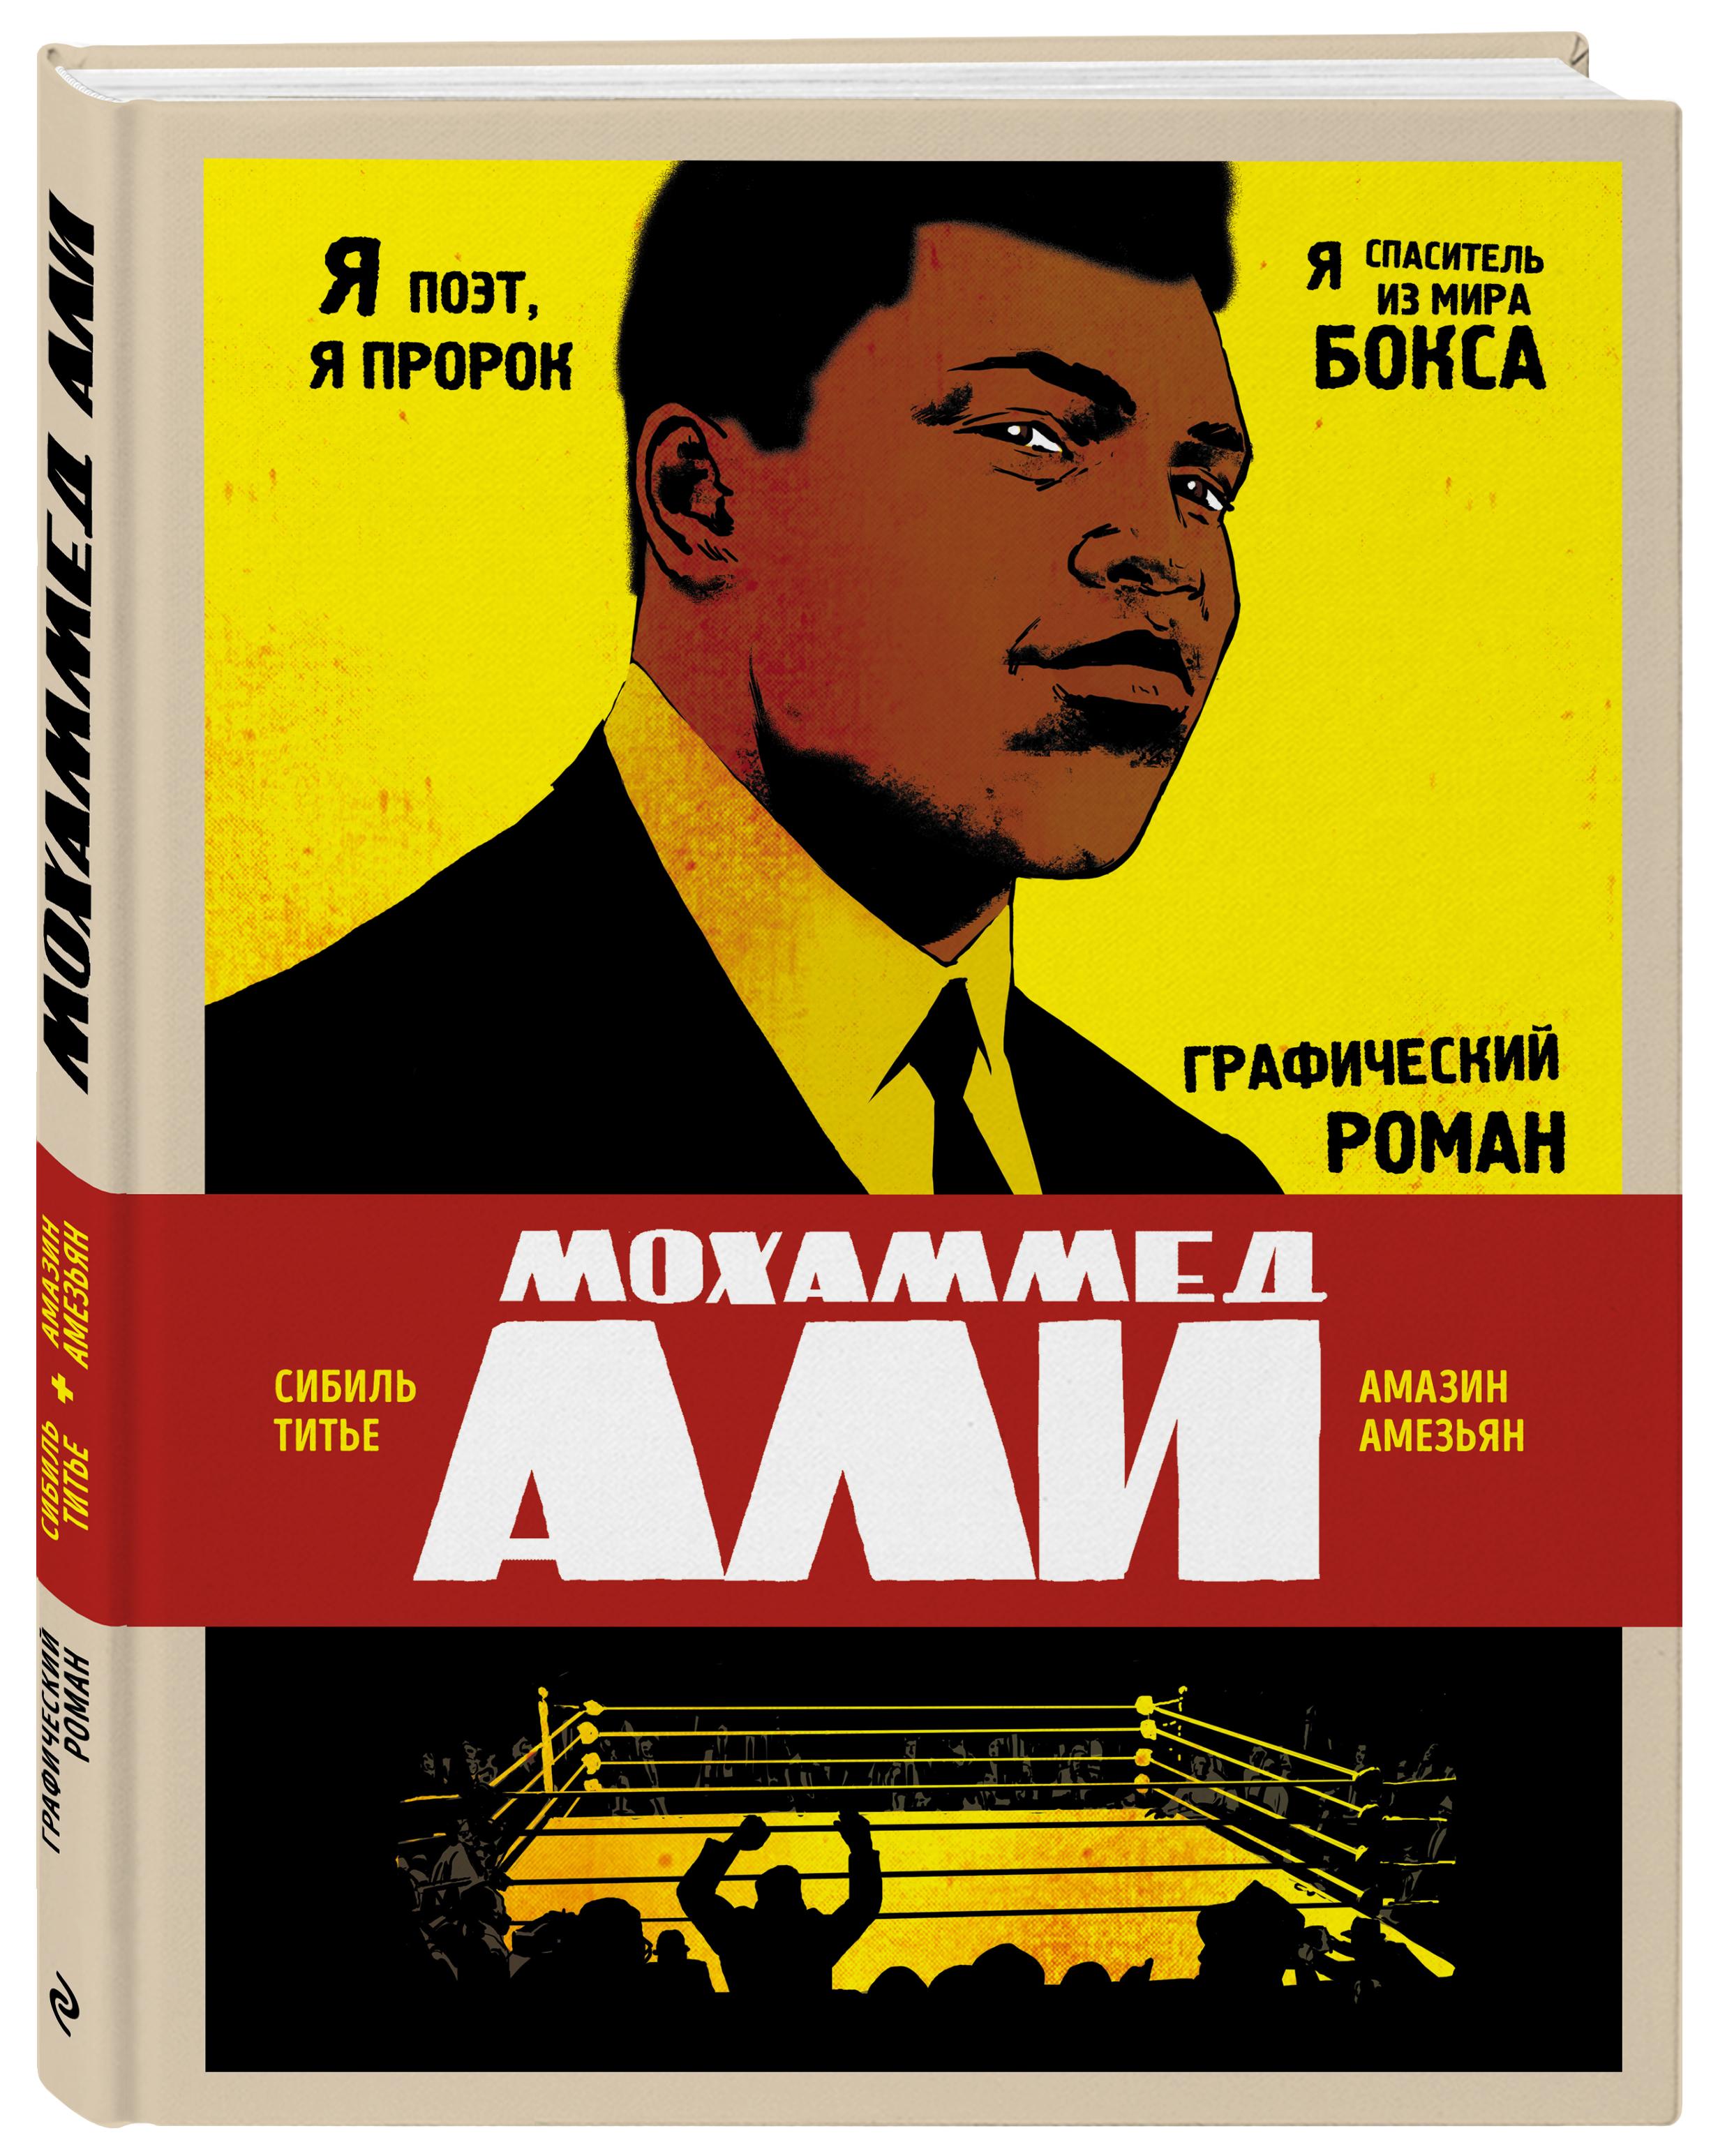 Сибиль Титье, Амазин Амезьян Мохаммед Али. Графический роман